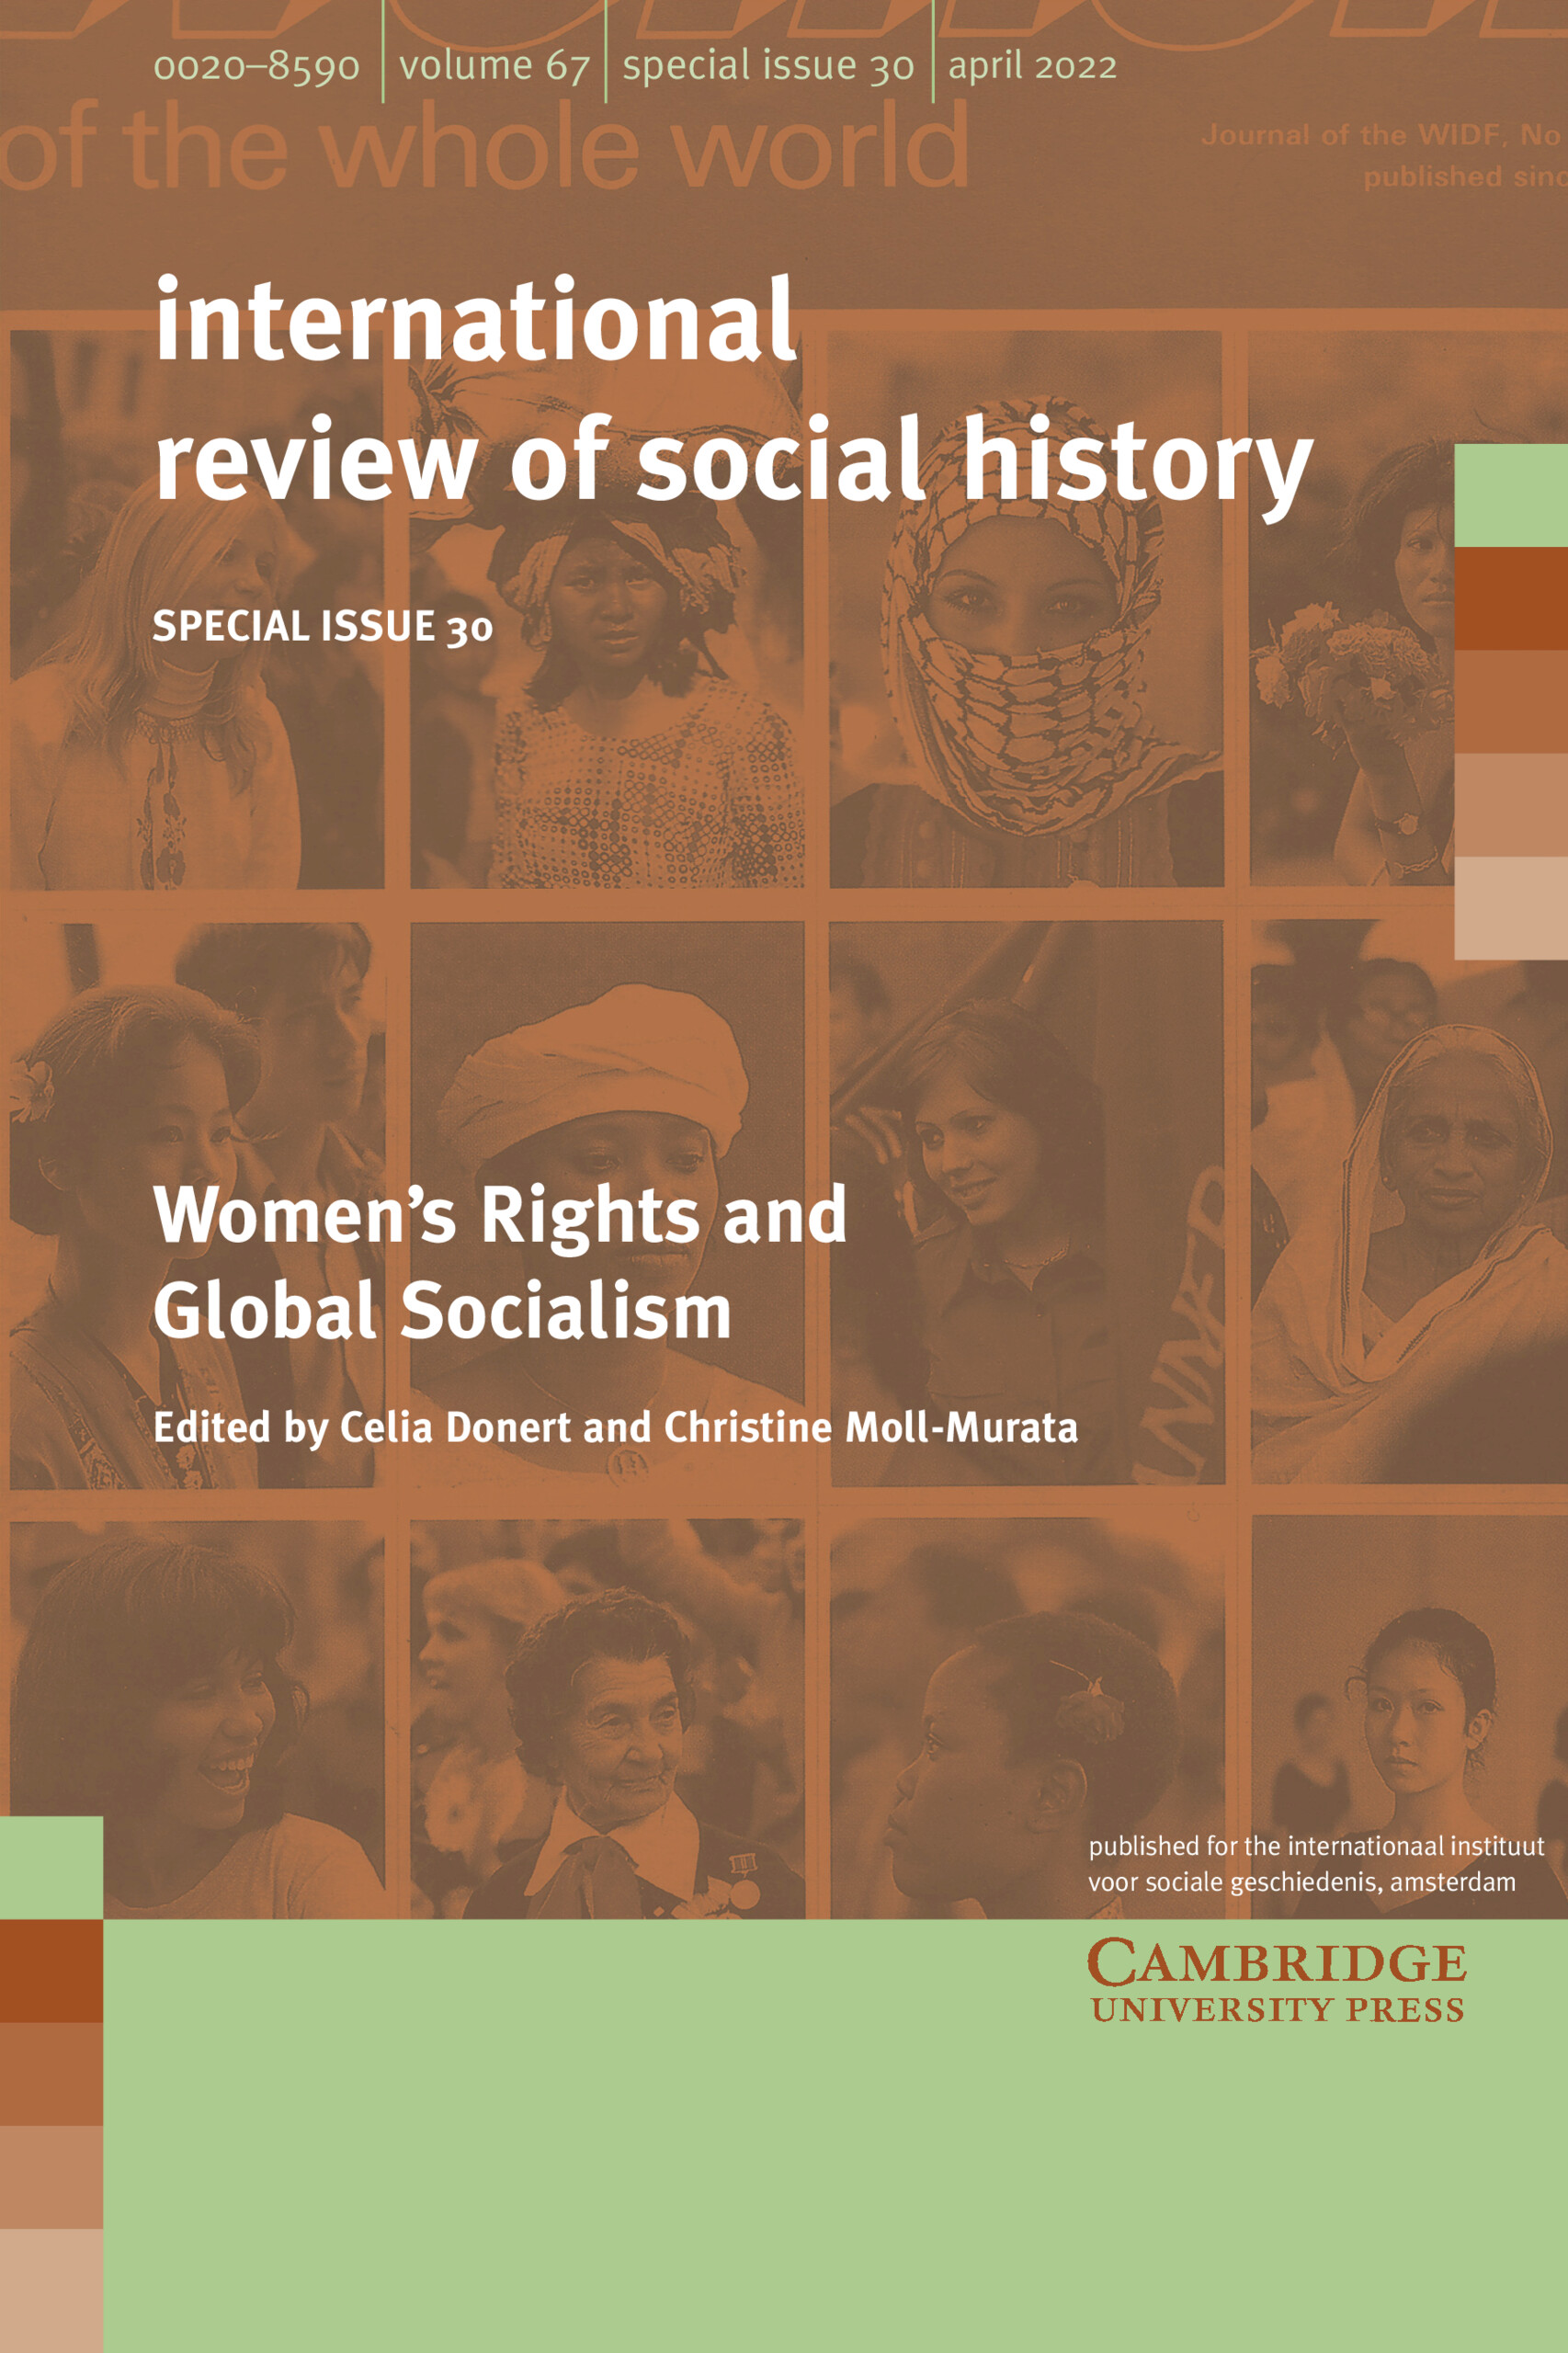 International Review of Social History | Cambridge Core